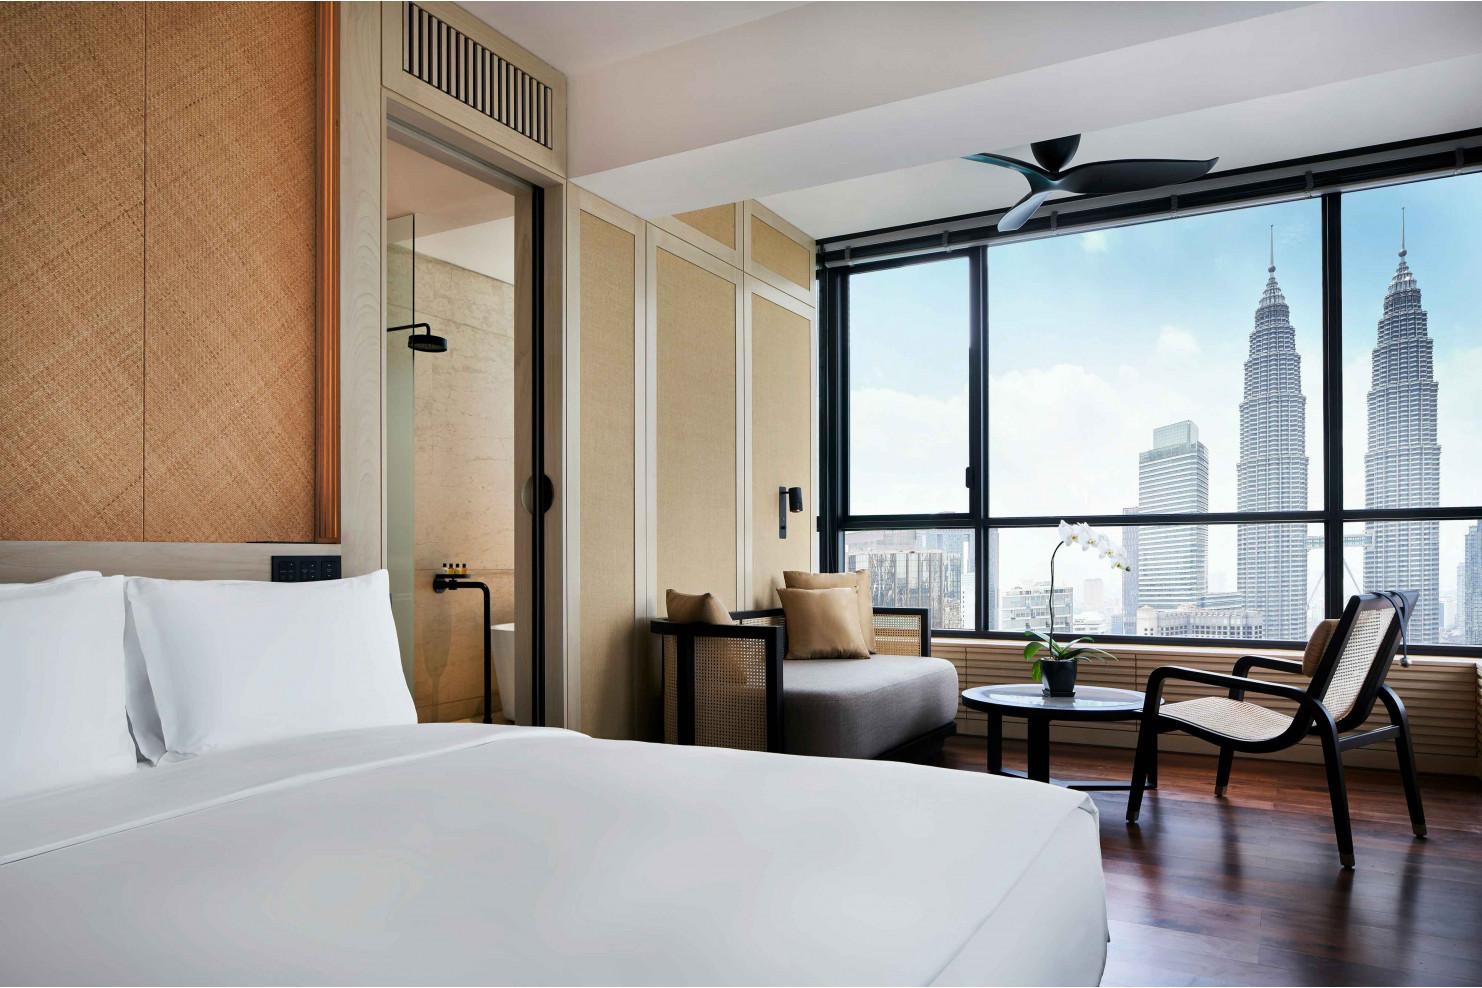 The RuMa Hotel and Residences | Kuala Lumpur | Smith Hotels